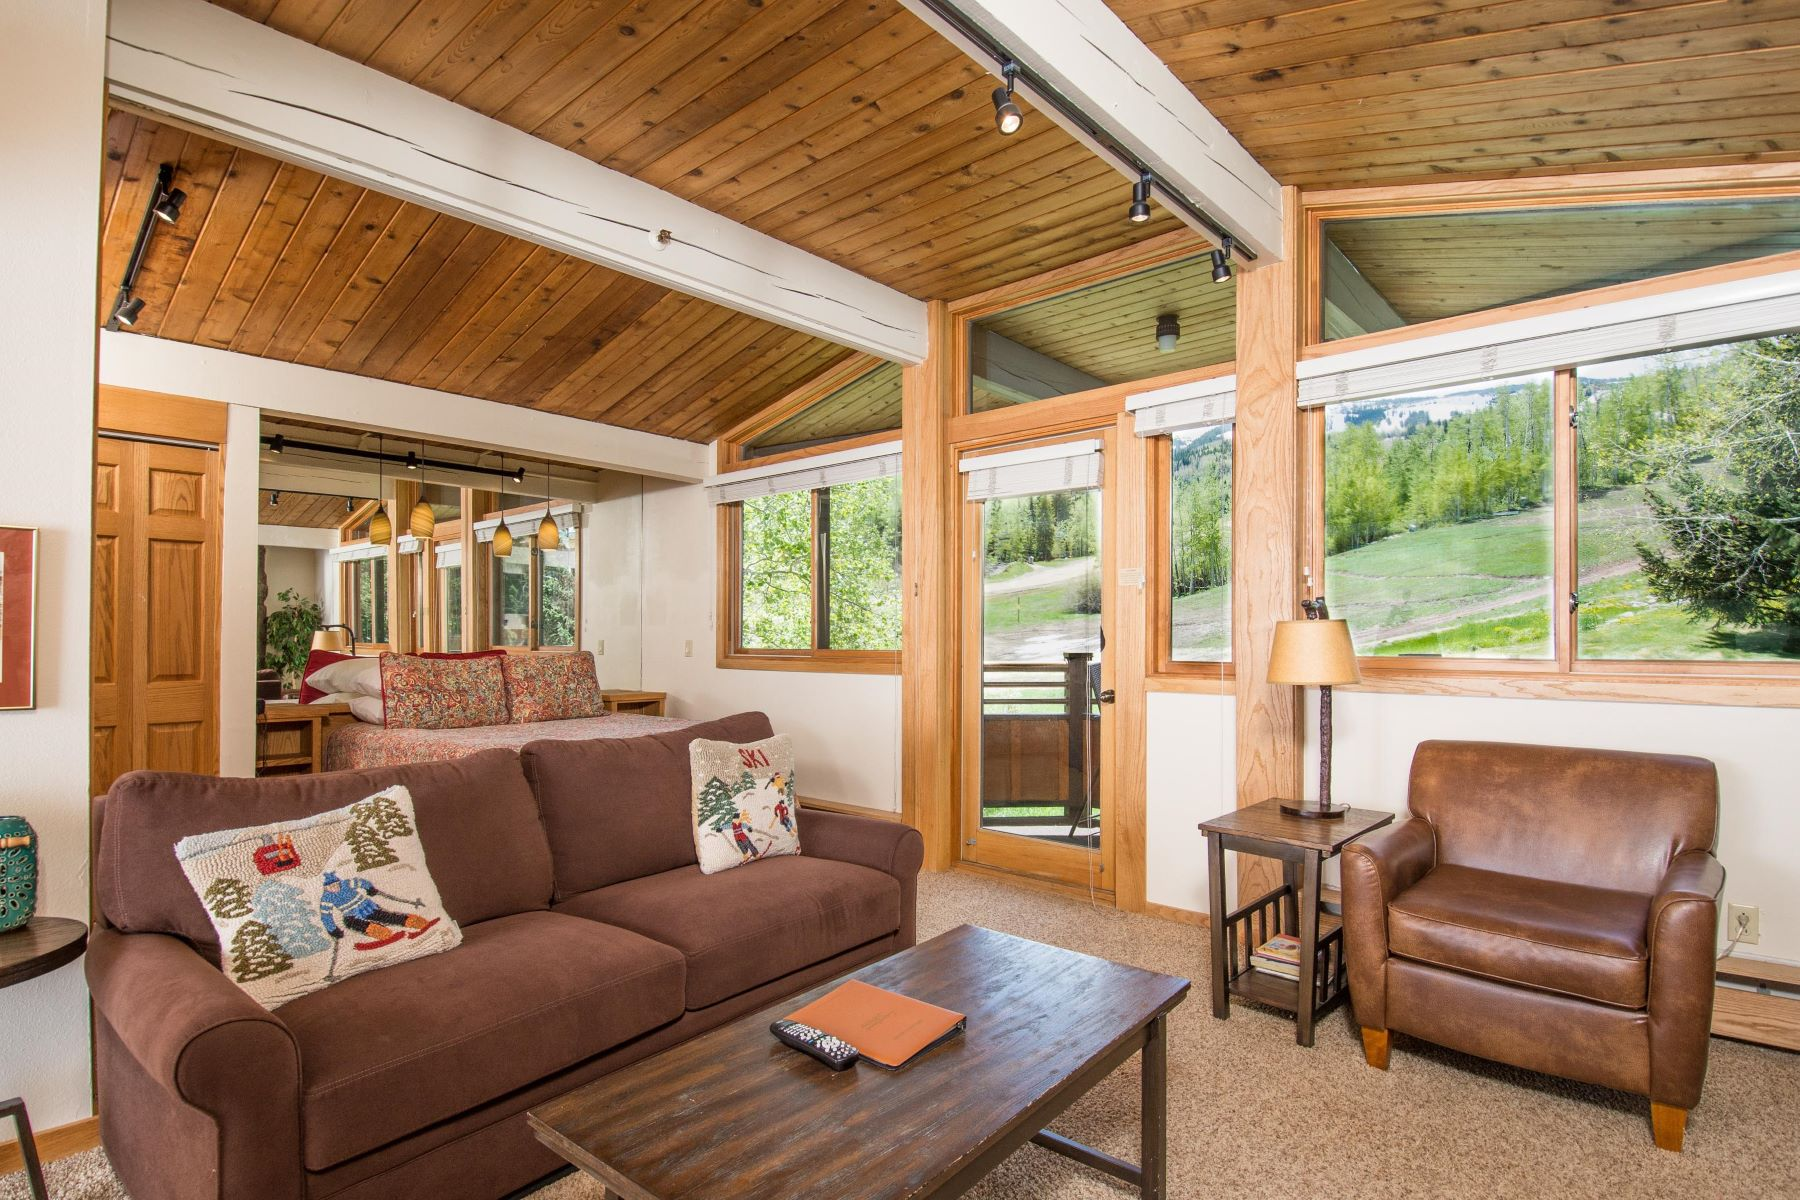 Condominiums для того Продажа на Perfect Ski Pied-à-terre! 640 Carriage Way, Unit, Snowmass Village, Колорадо 81615 Соединенные Штаты